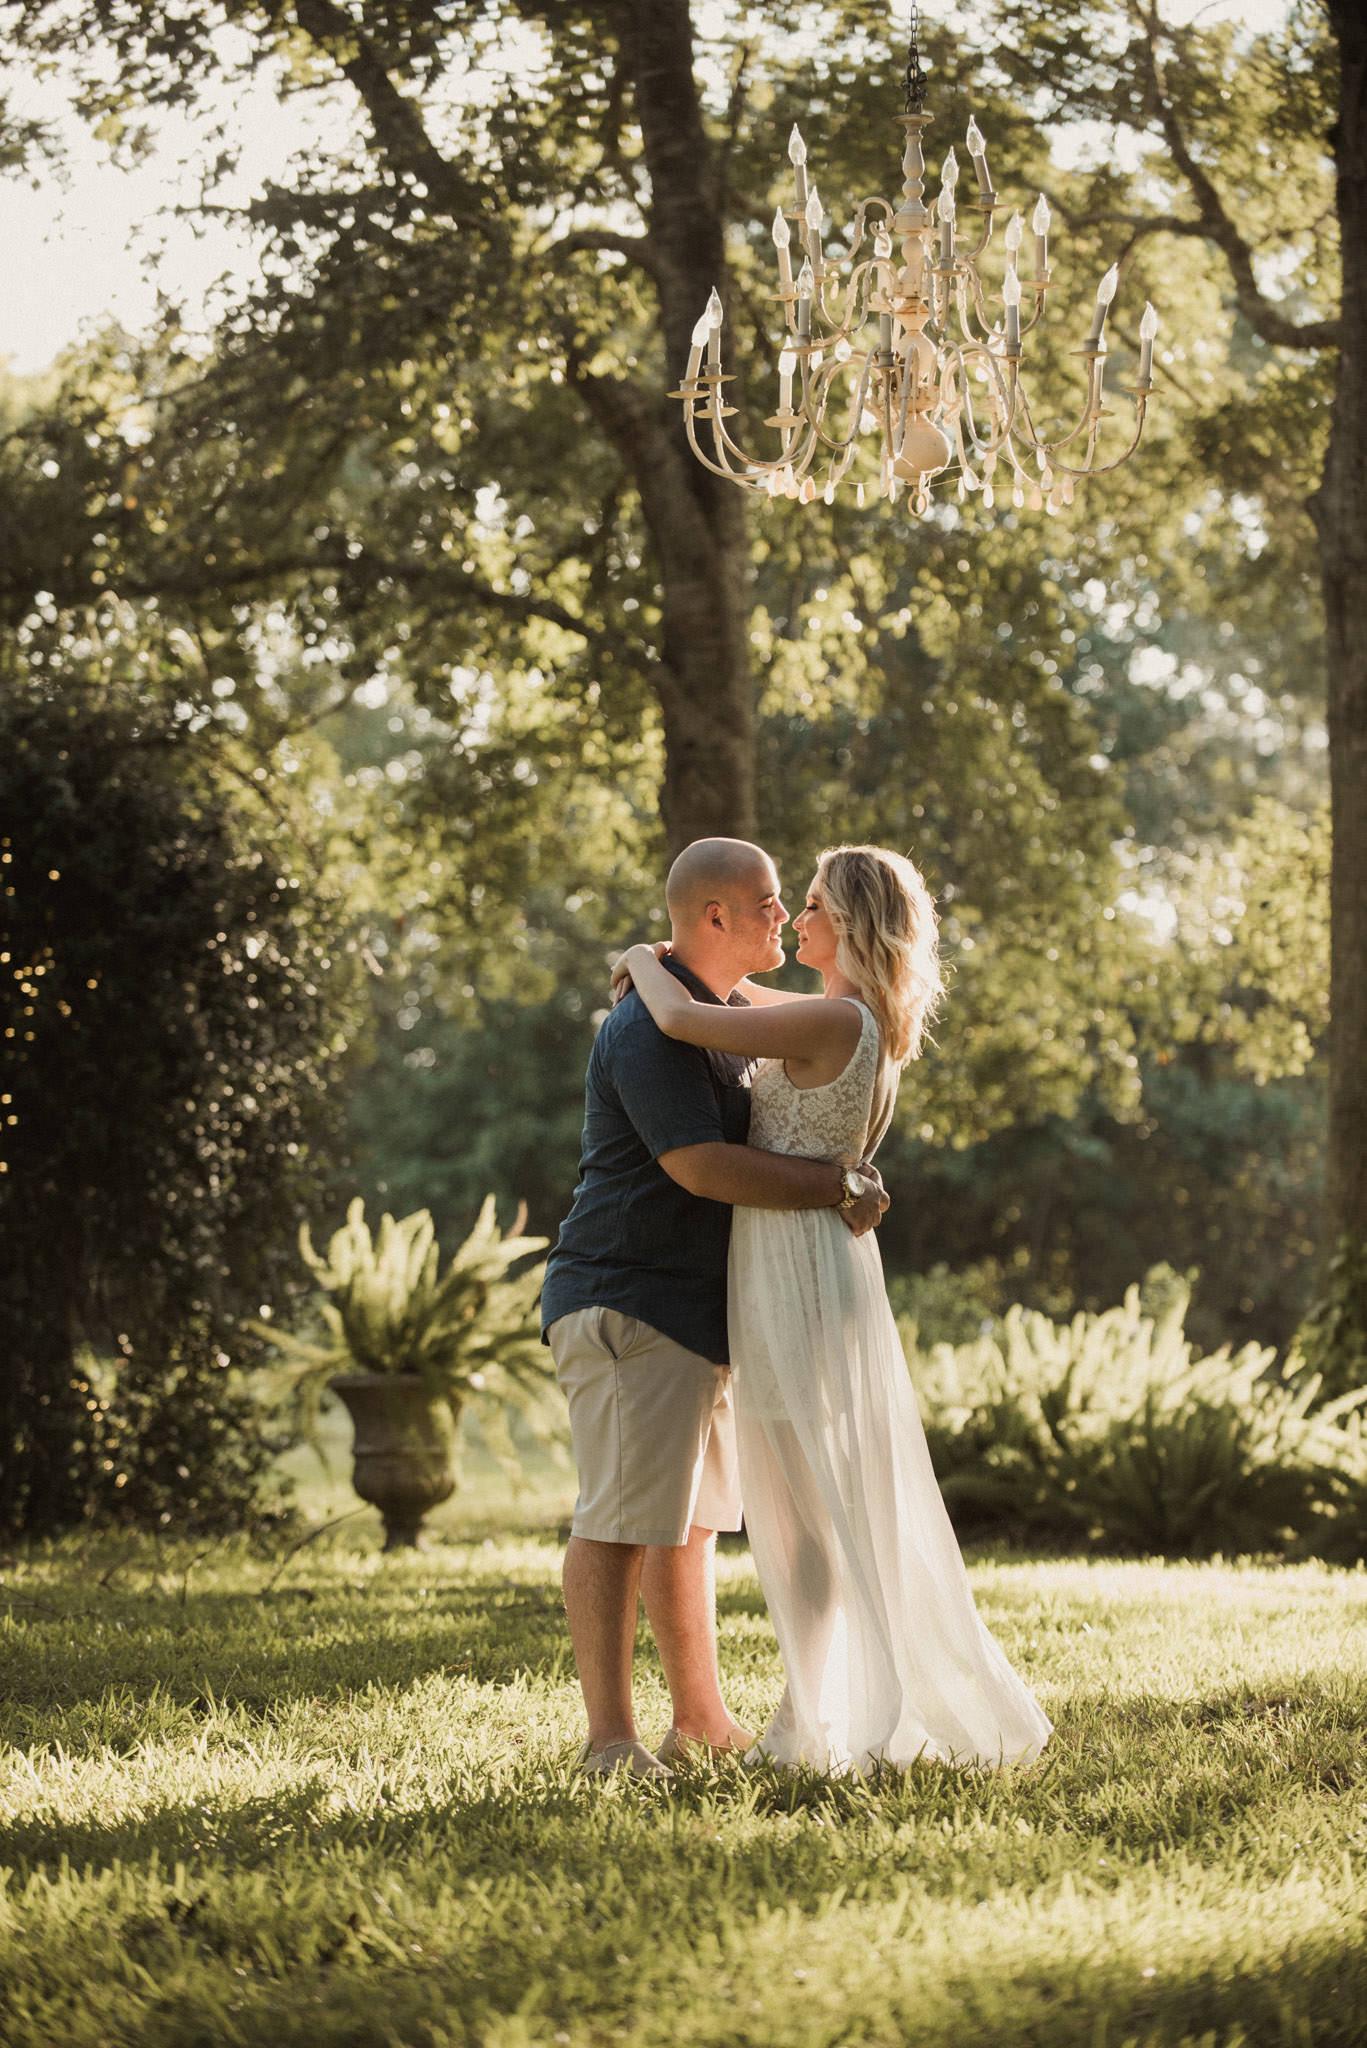 Plantation-elegance-dickinson-tx-engagement-wedding-venue-photographer-alvin